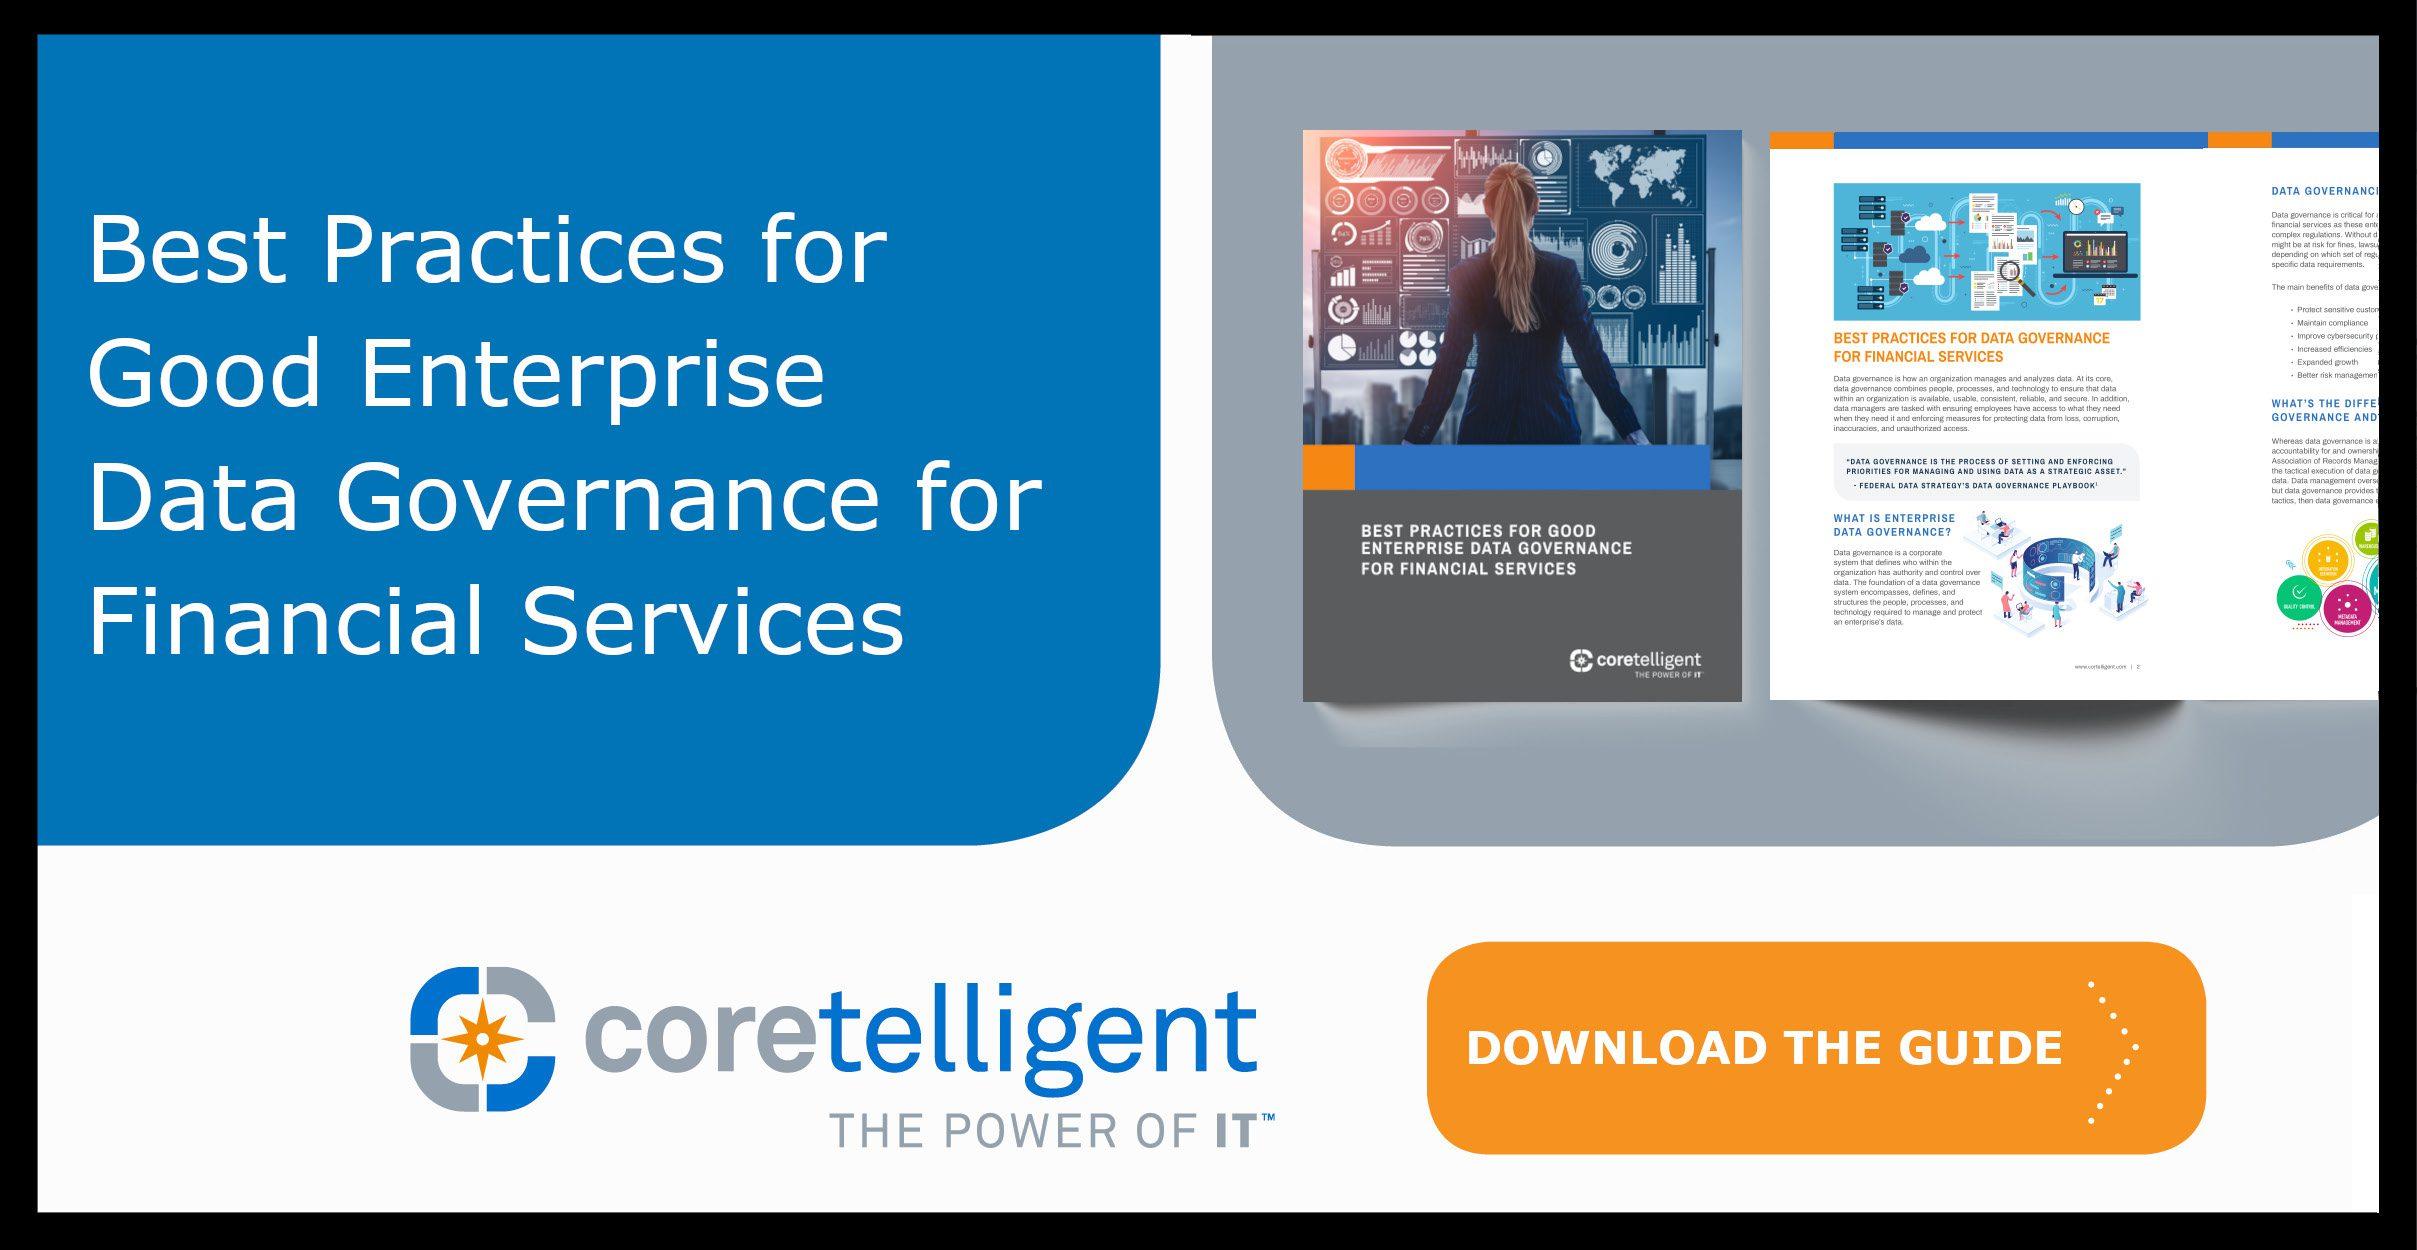 Best Practices for Good Enterprise Data Governance for Financial Services